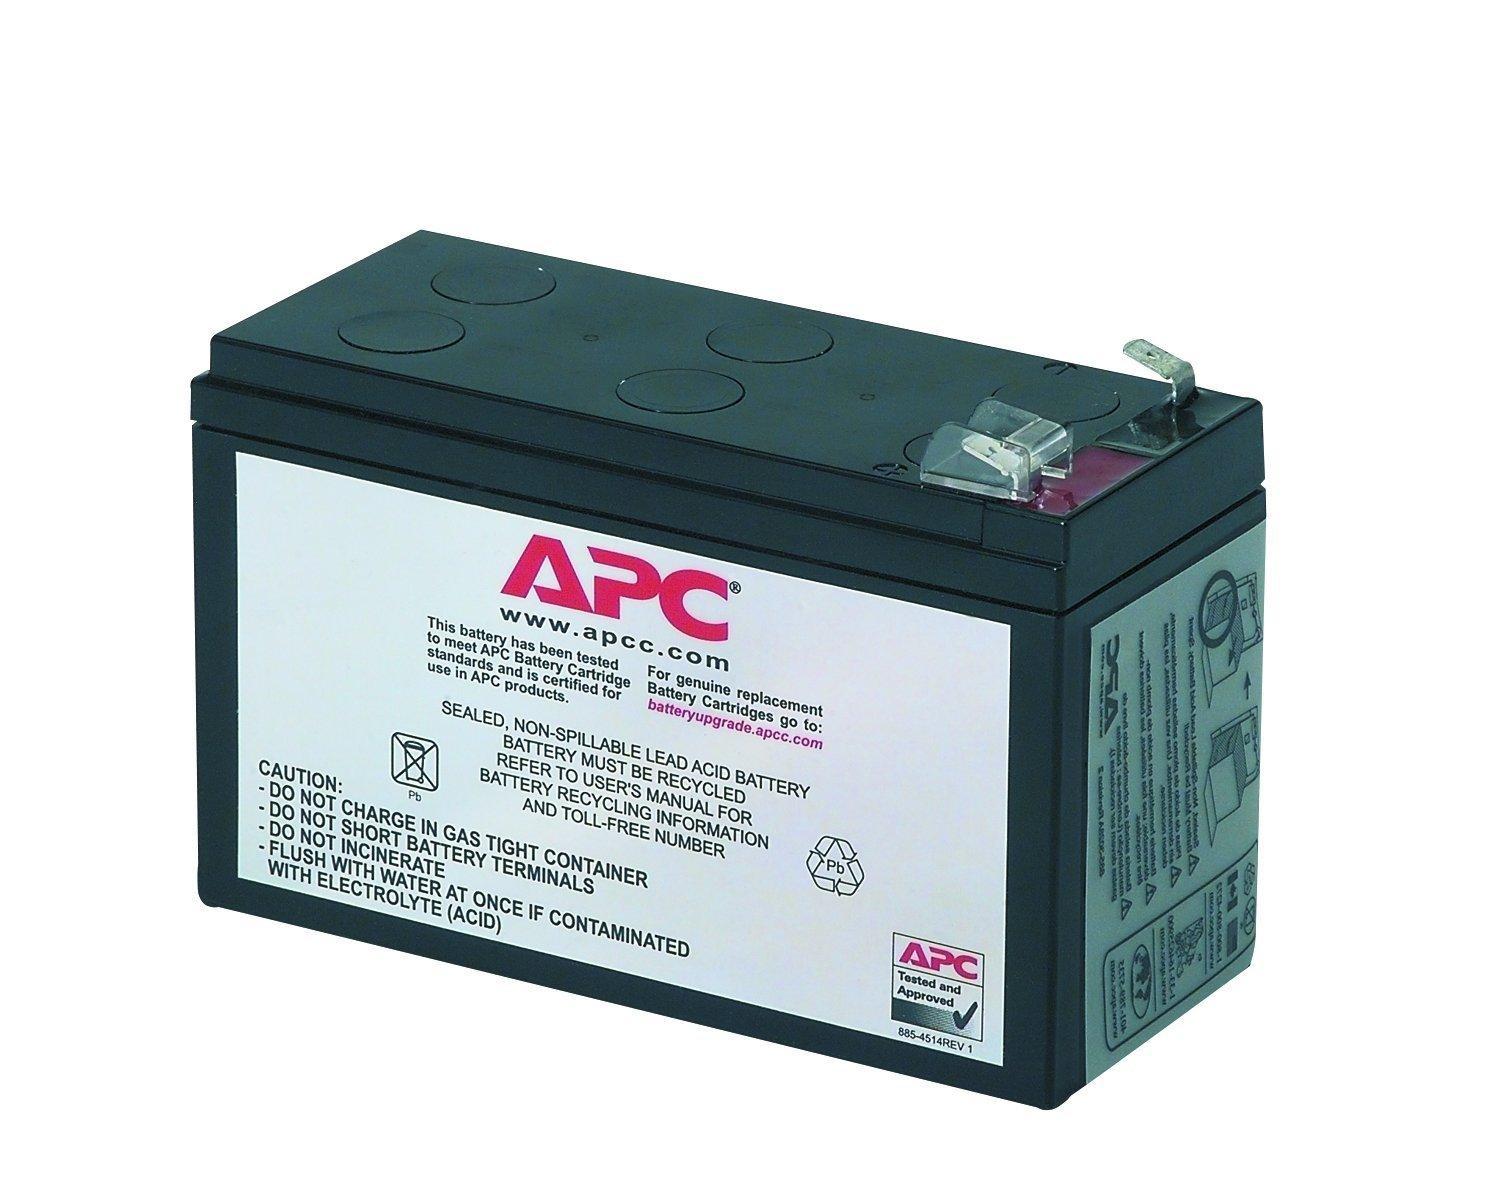 amazon com apc ups replacement battery cartridge for apc ups models rh amazon com Dual Battery Wiring Diagram Battery Isolator Wiring-Diagram